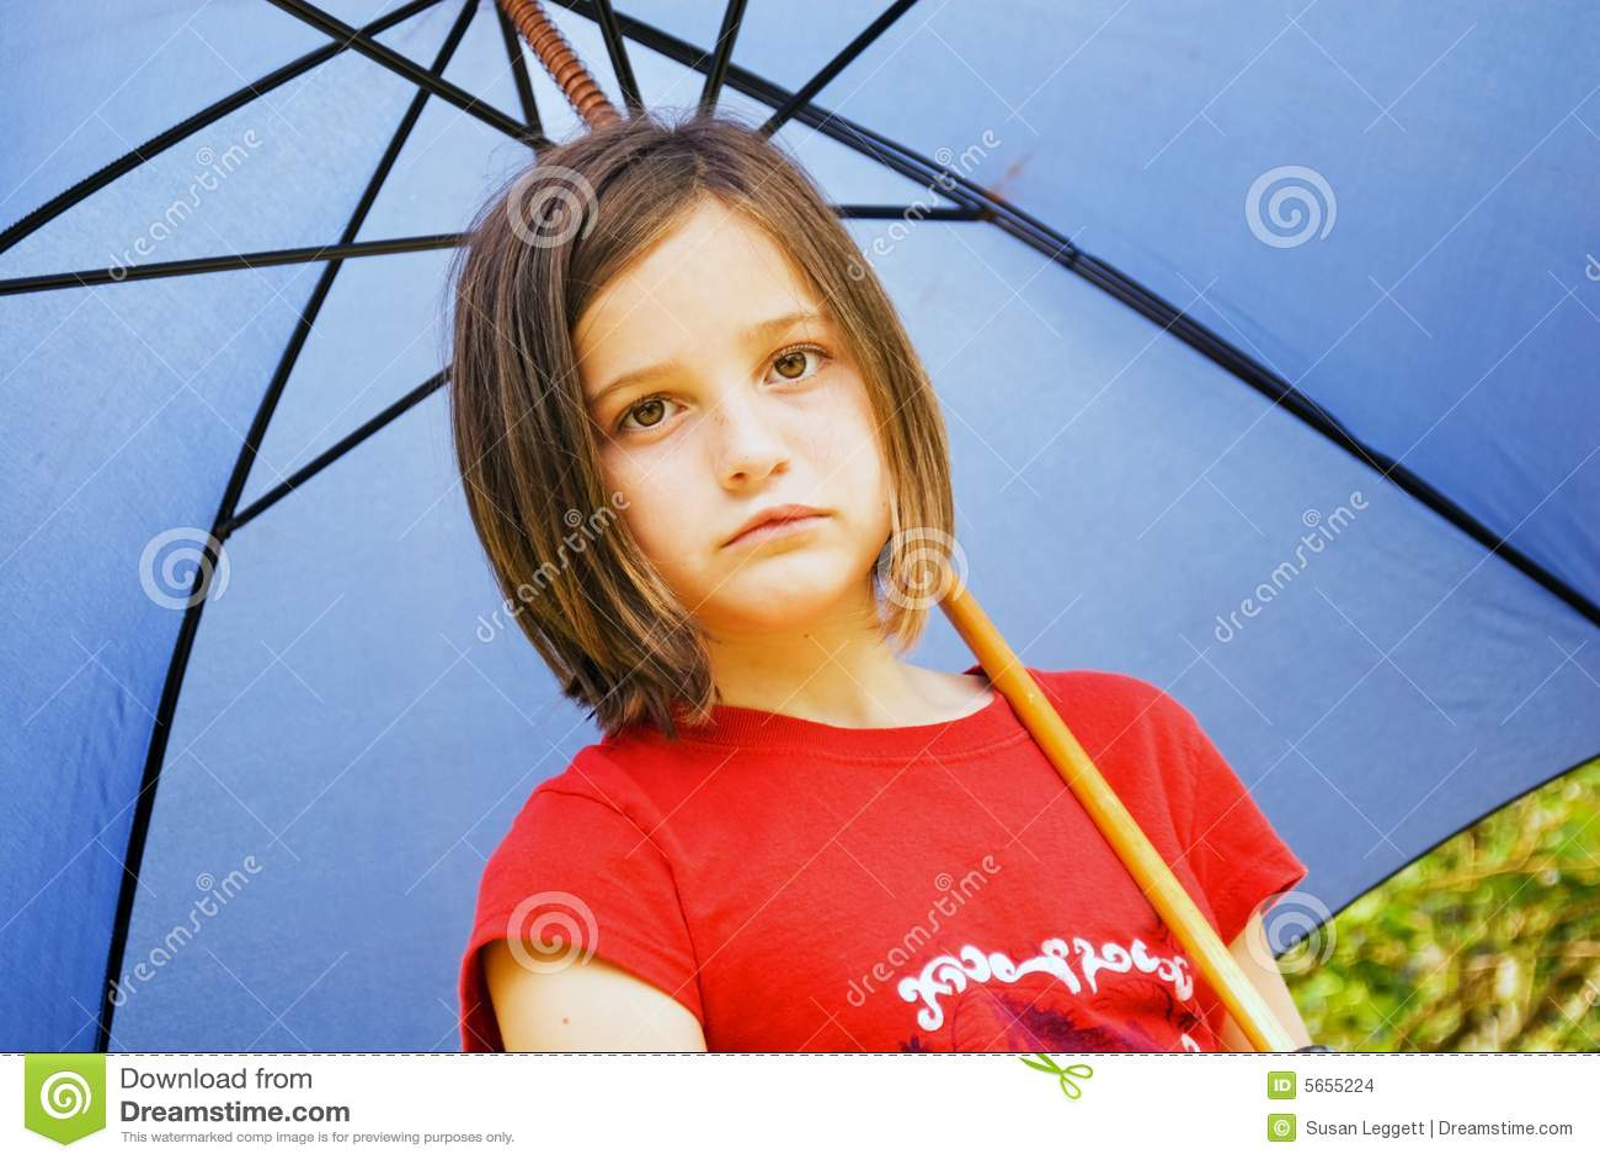 Sad Girl With Blue Umbrella